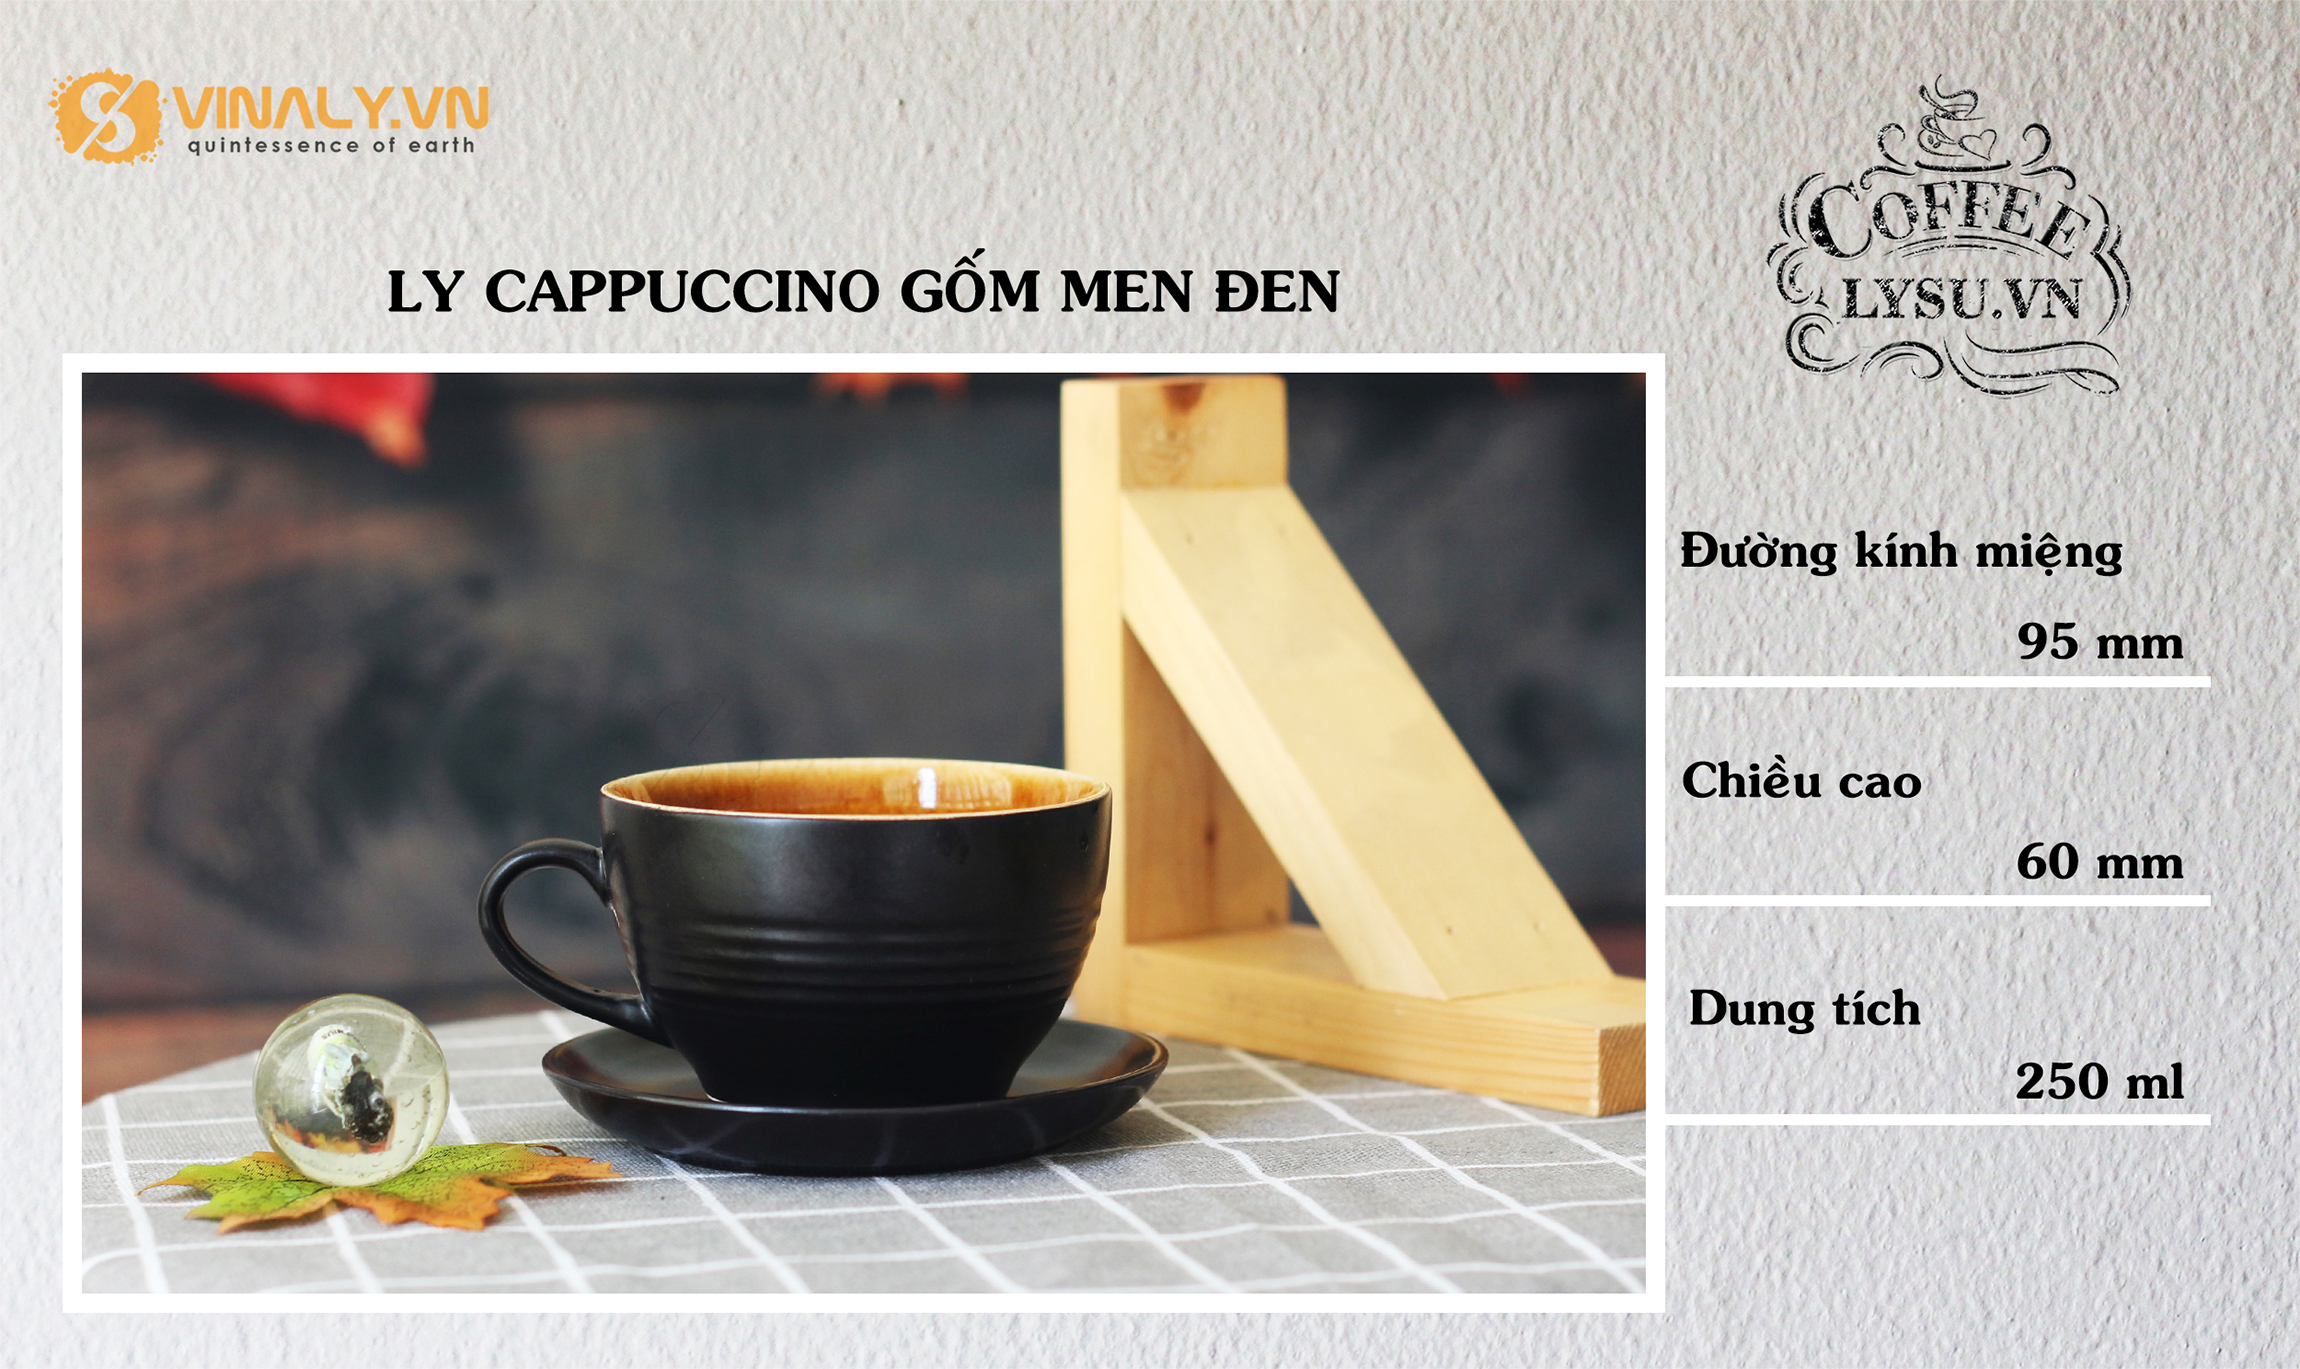 ly-su-vinaly-ly-su-quan-cafe-ly-cappuccino-ly-su-cappuccino-gom-men-den